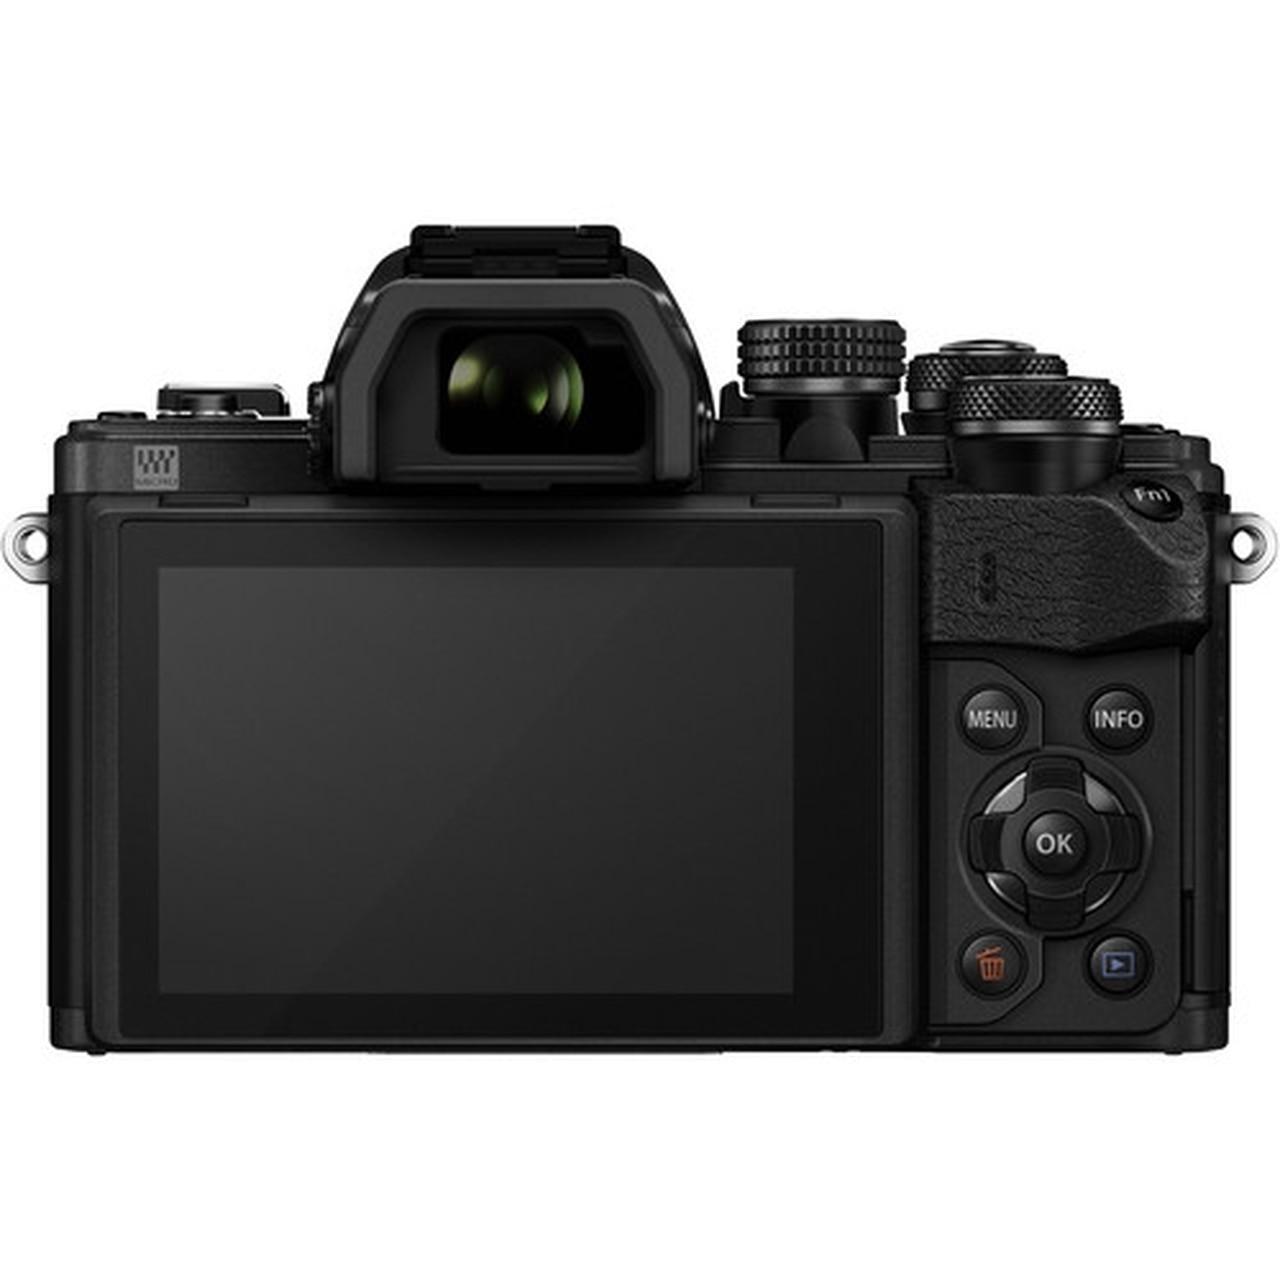 Olympus OM-D E-M10 II Hybrid 16 - Black